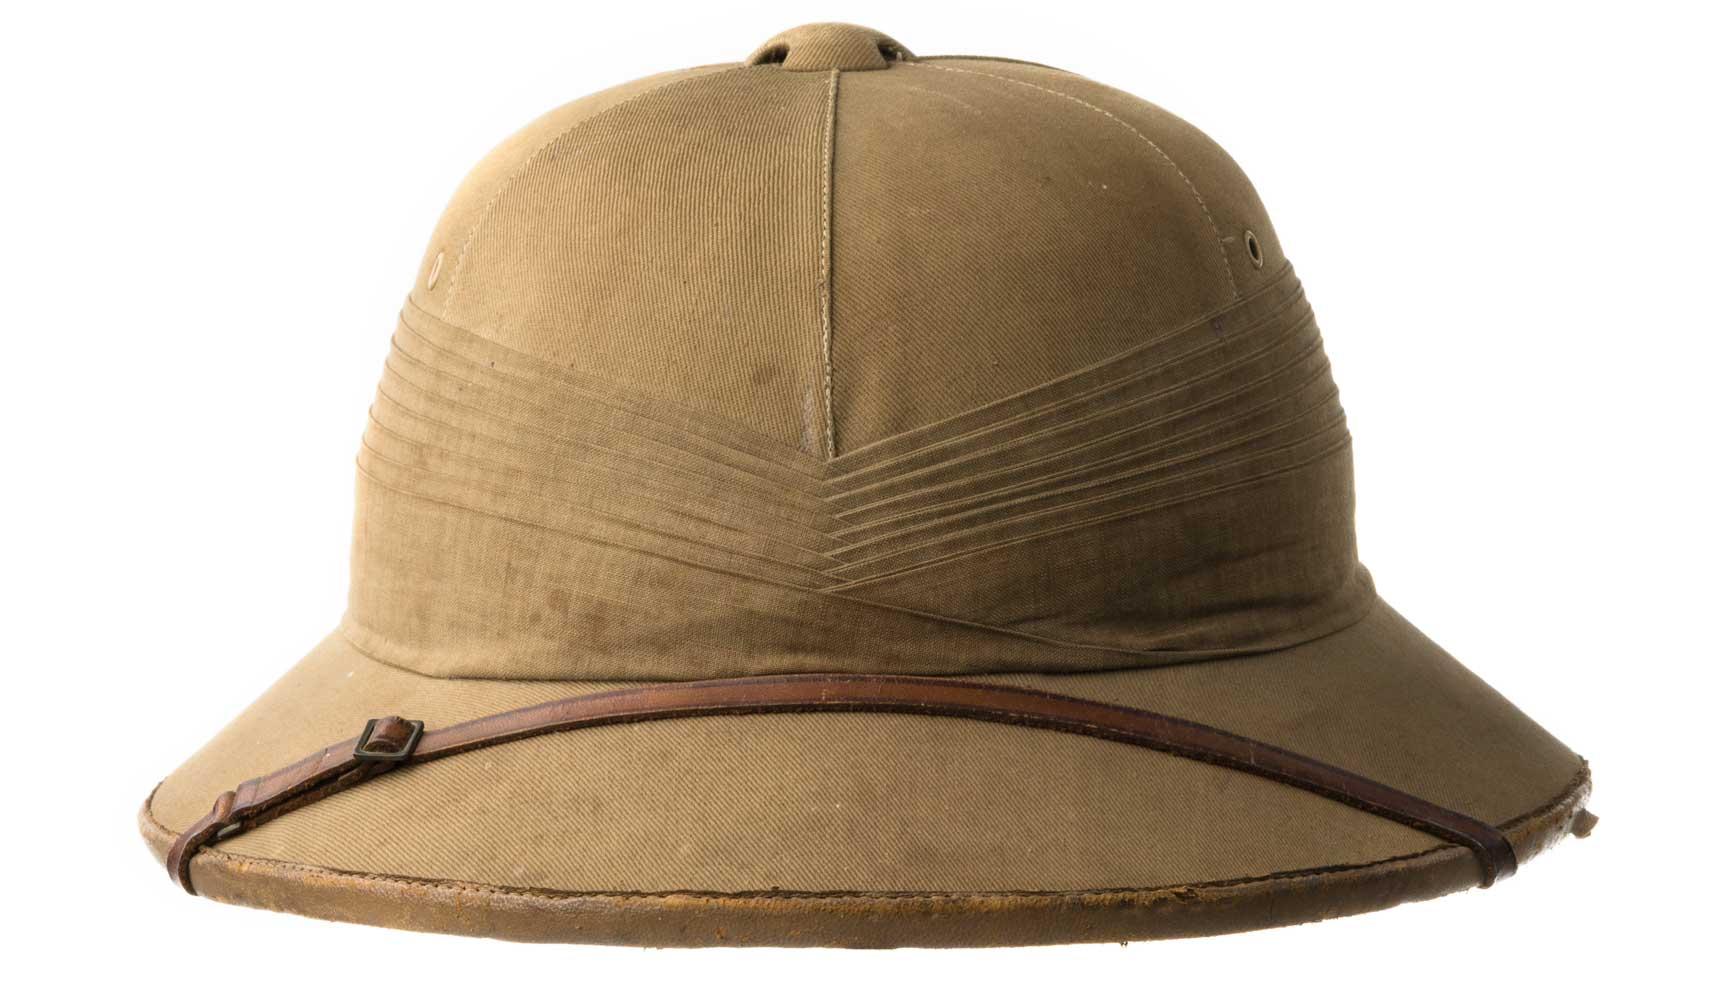 Robert Ripley's Safari Hat